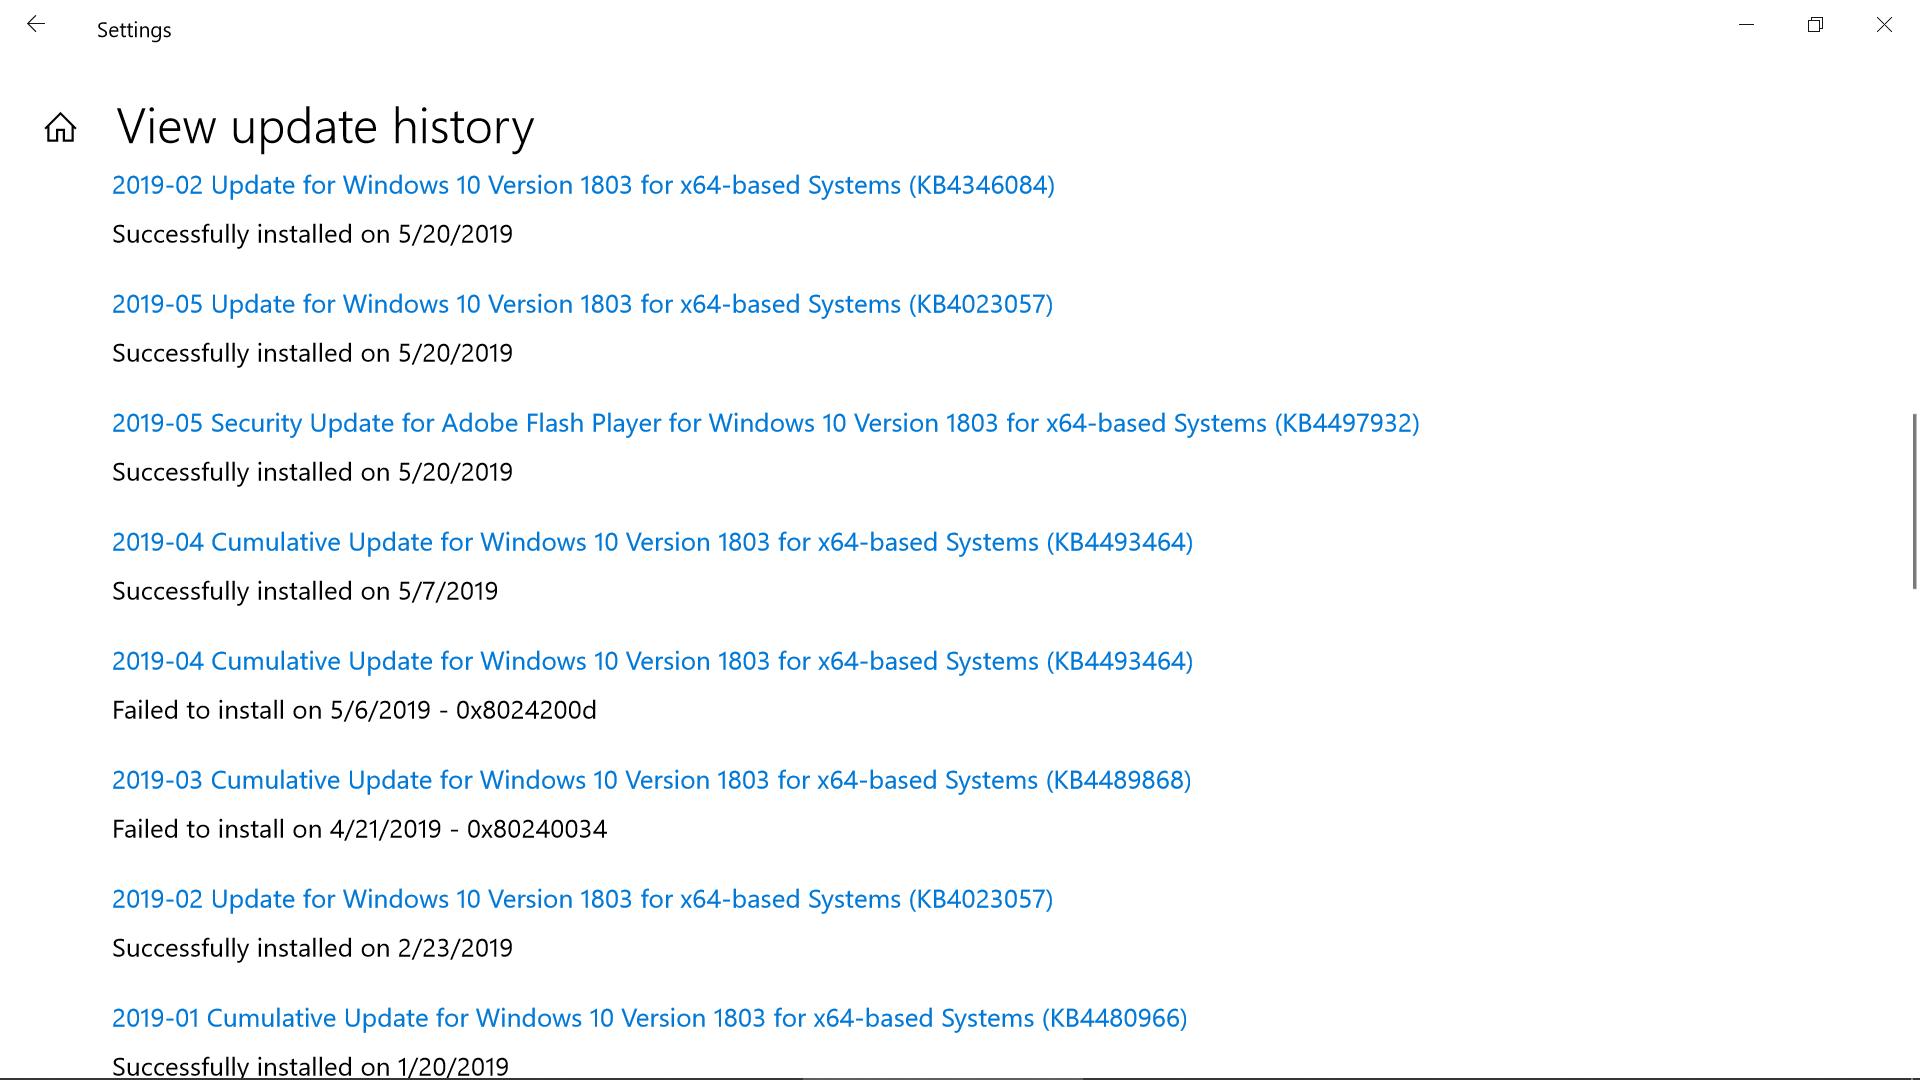 Windows-10-Update-History-2